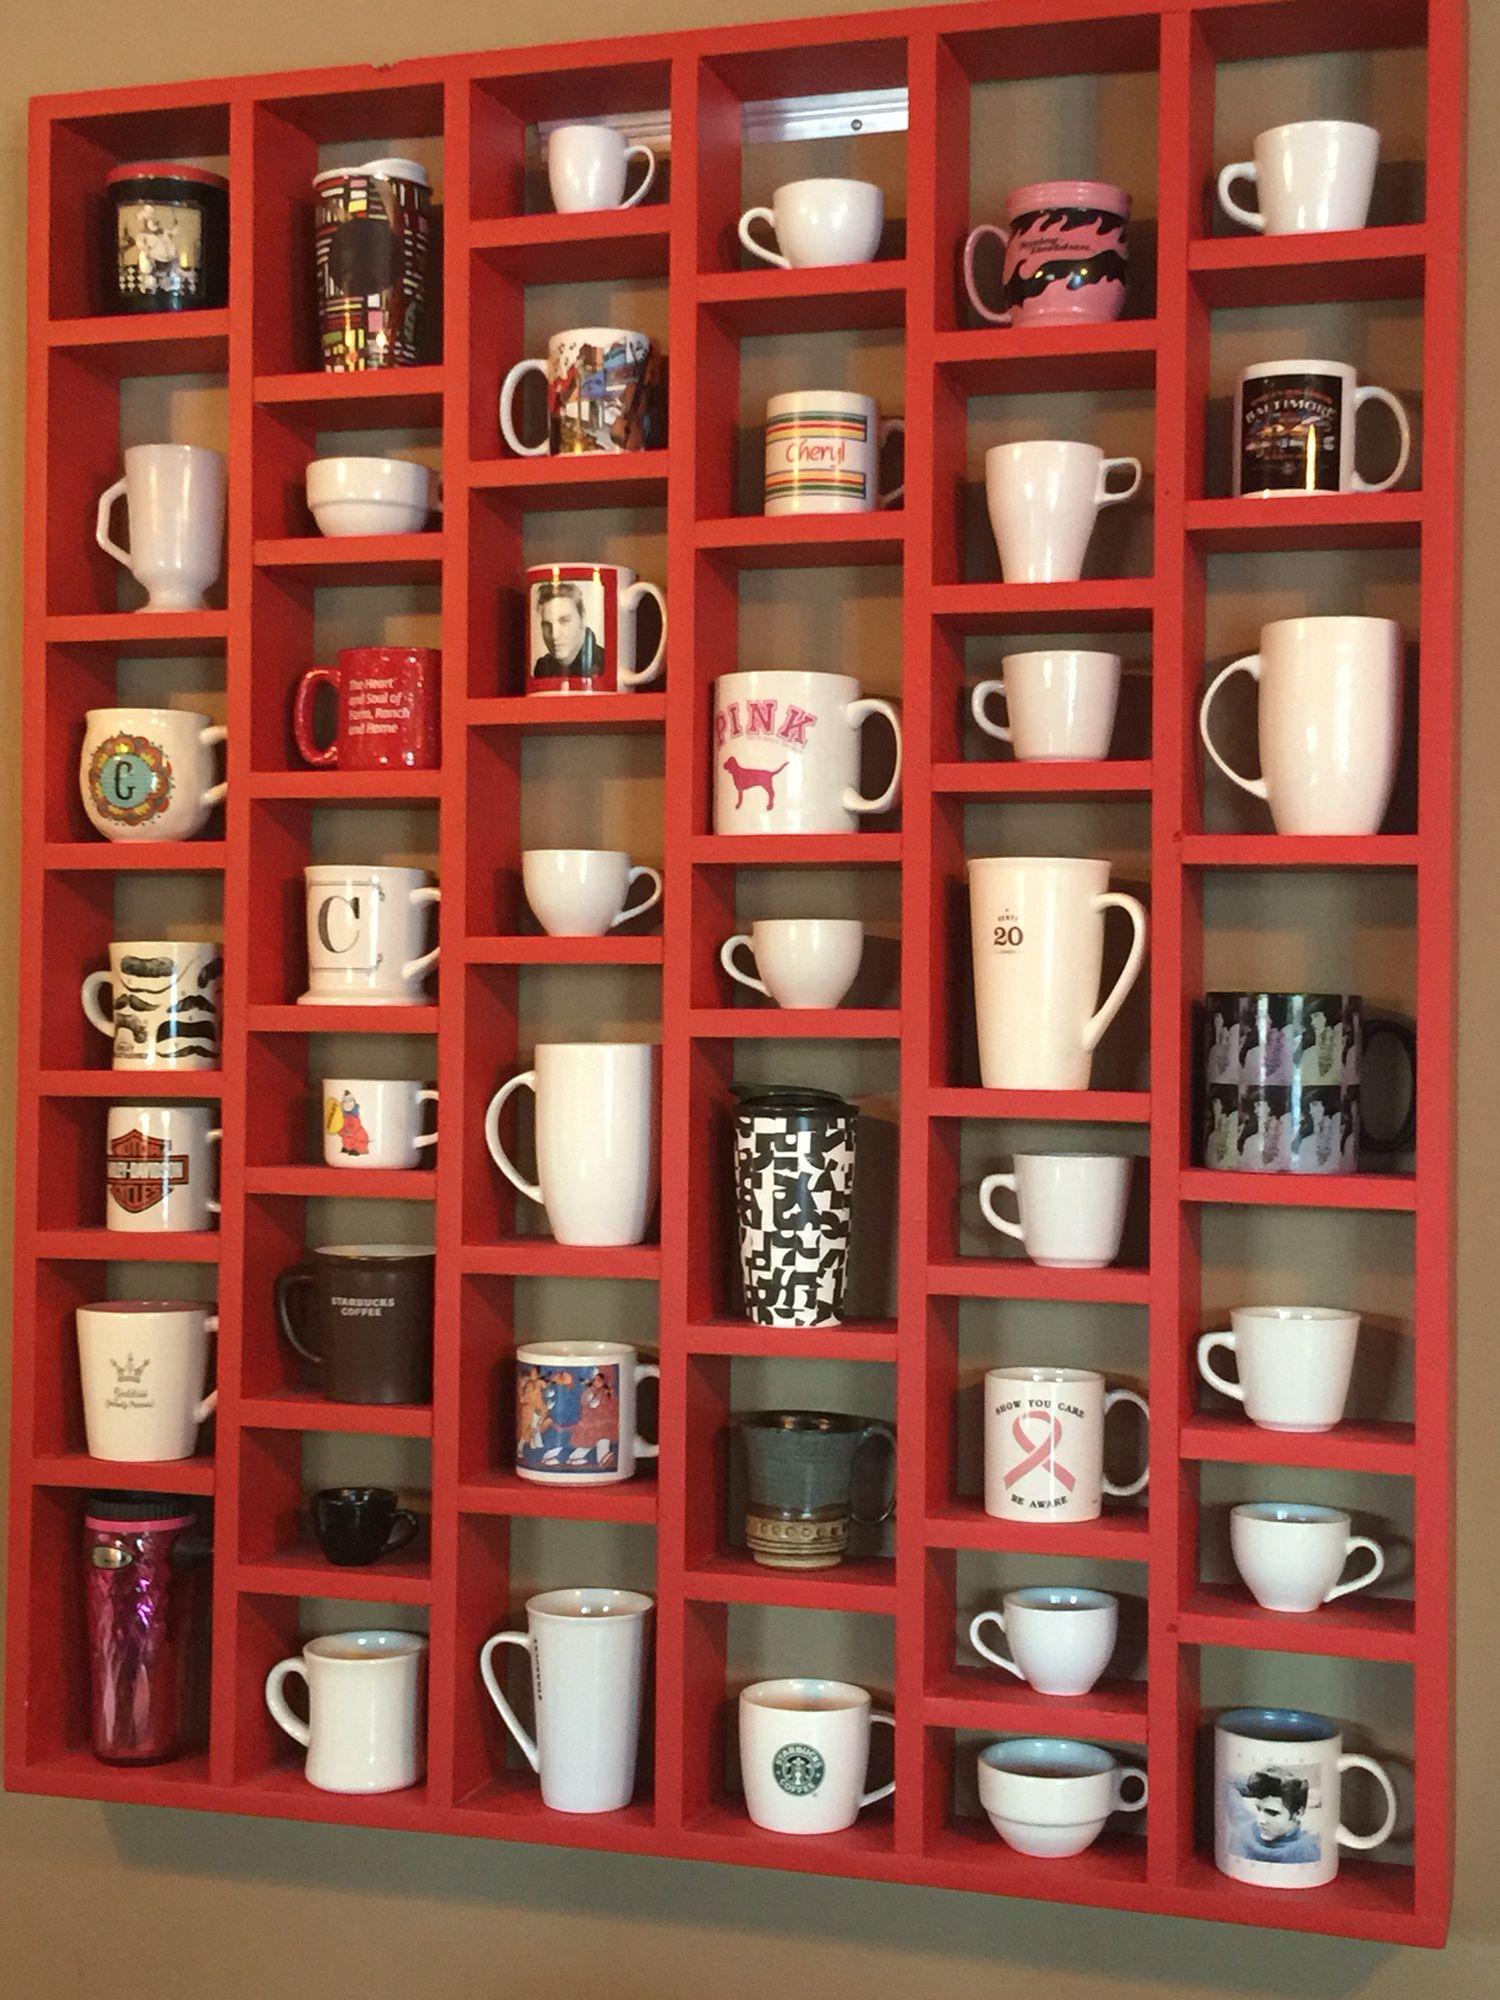 Coffee Cup Shelf By J Koehnen Coffee Mug Display Coffee Bar Home Diy Kitchen Storage